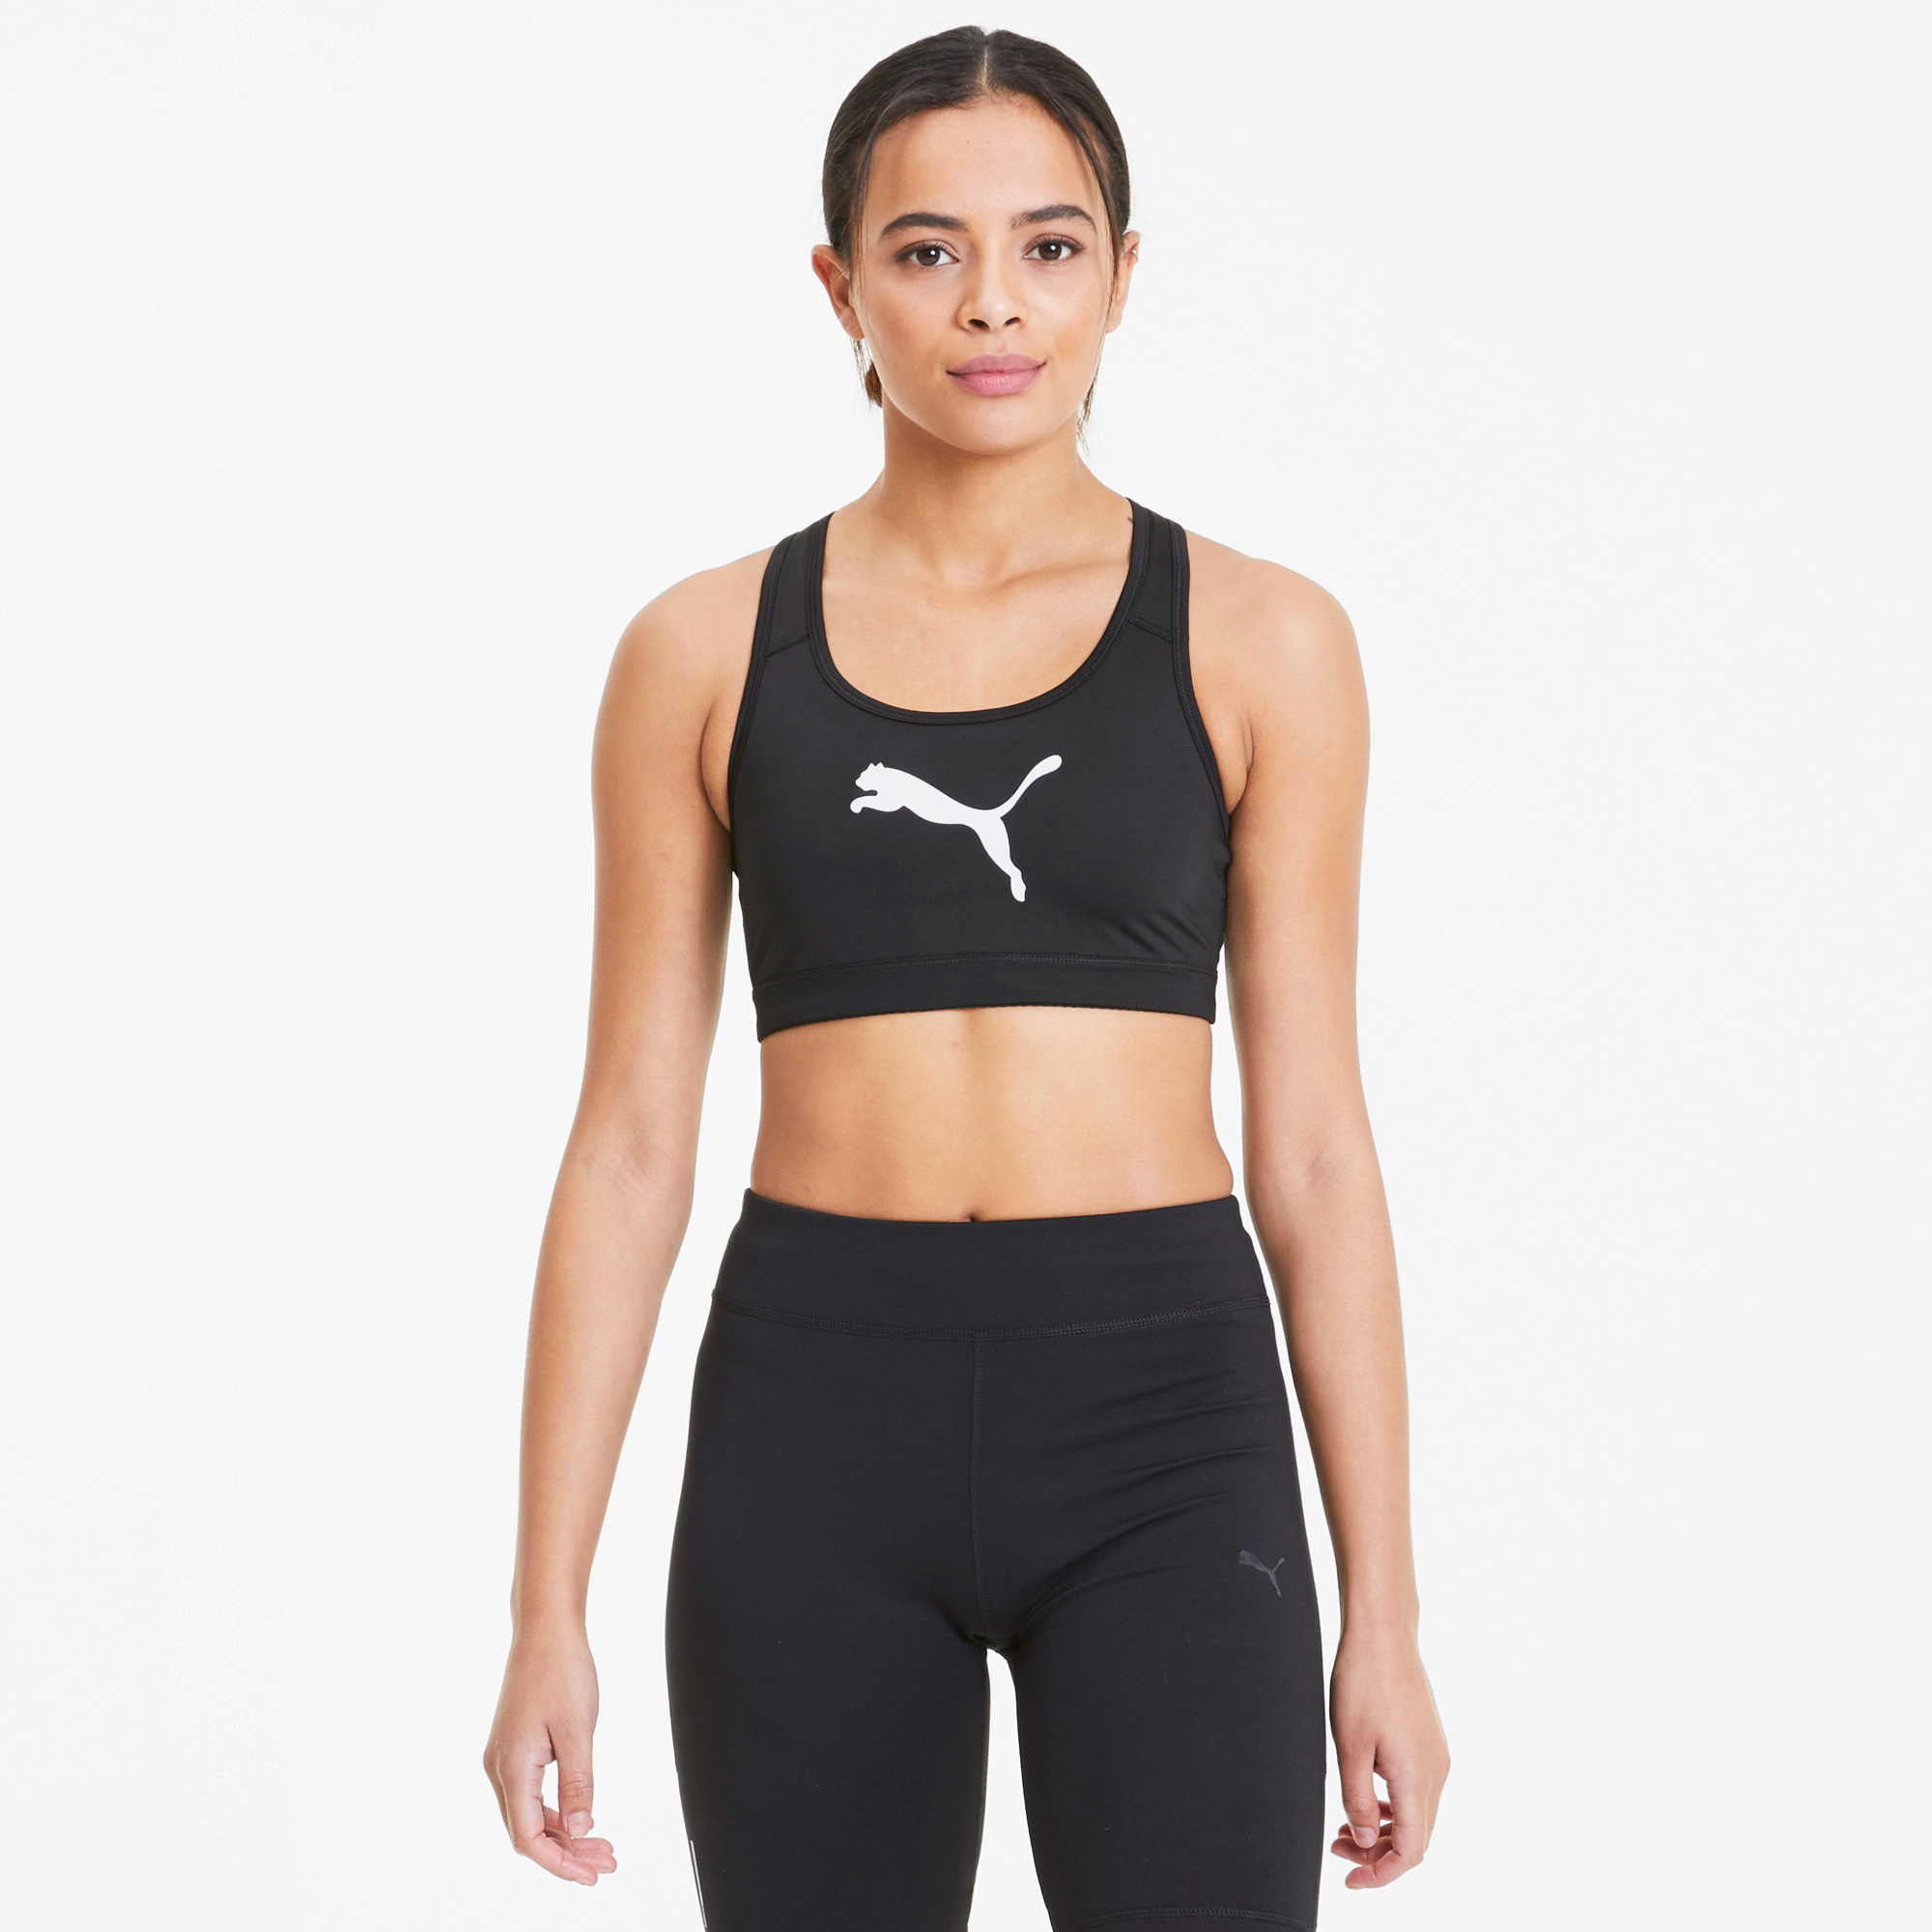 Puma 4Keeps Kadın Siyah Bra